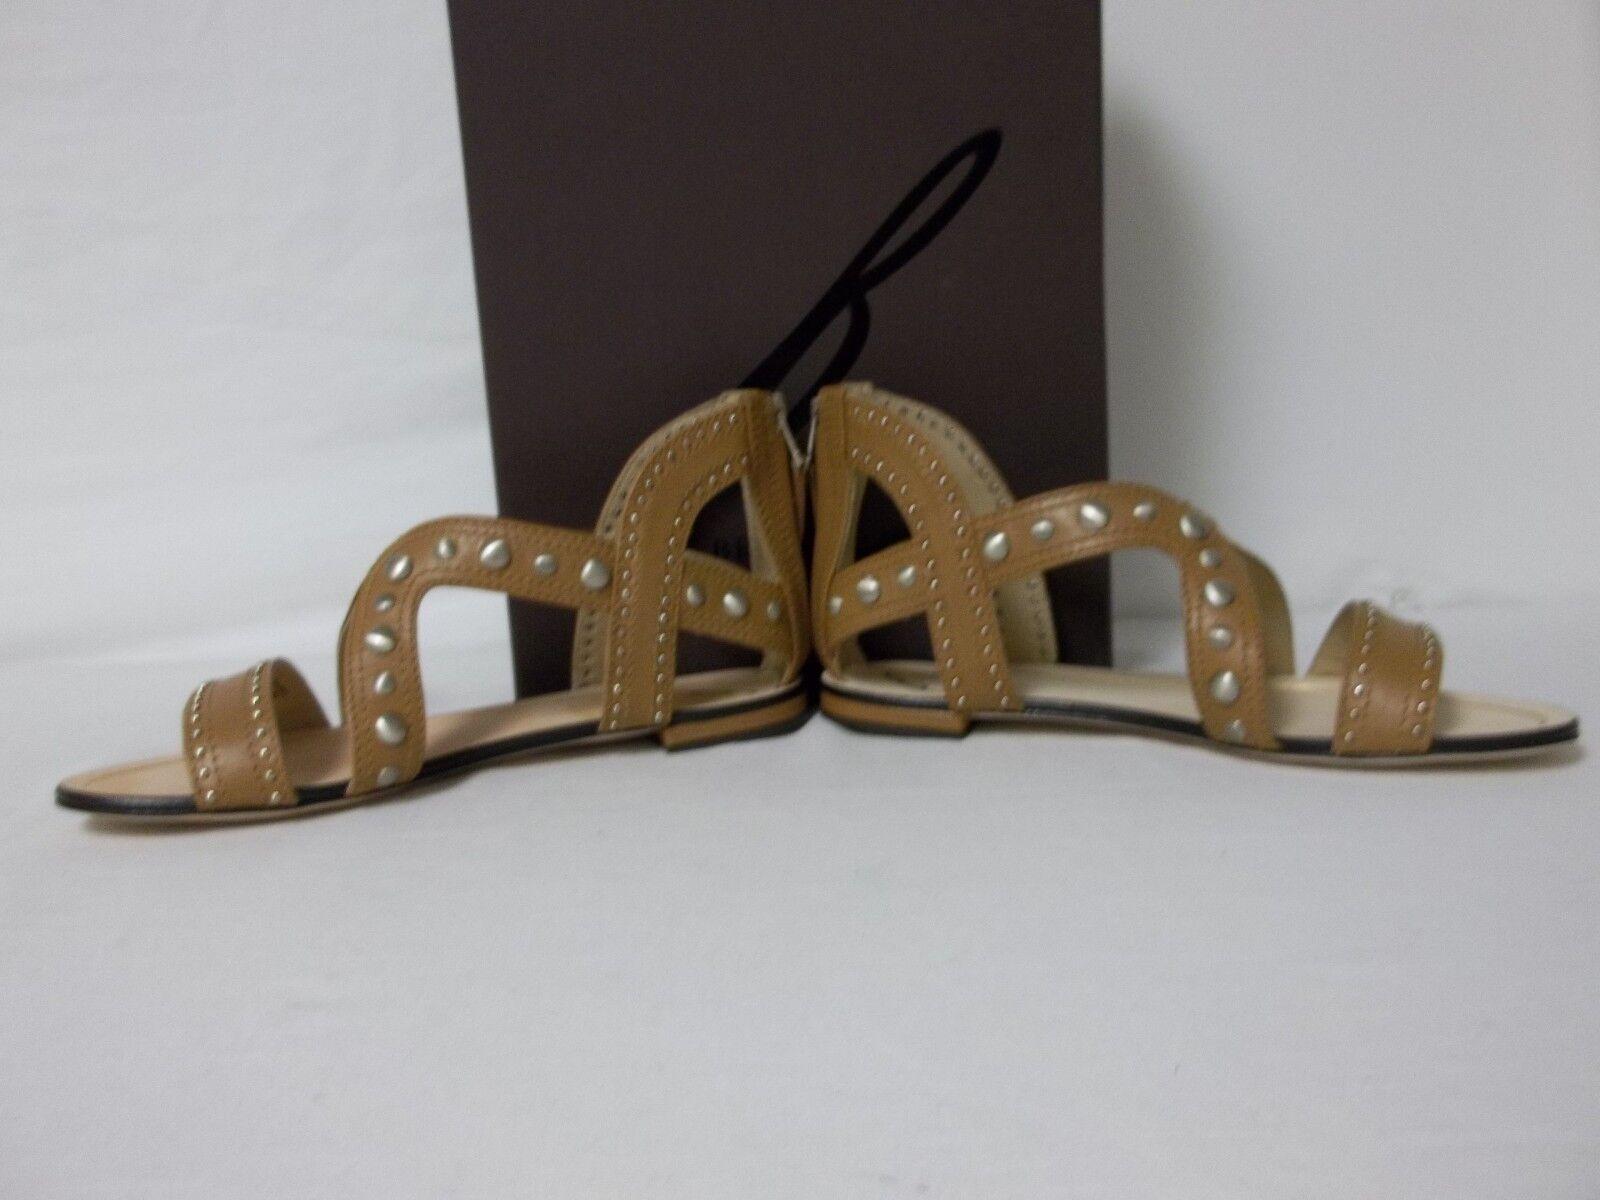 Brian Atwood Größe 6 M Angela Braun Leder Gladiator Sandales NEU Damenschuhe Schuhes